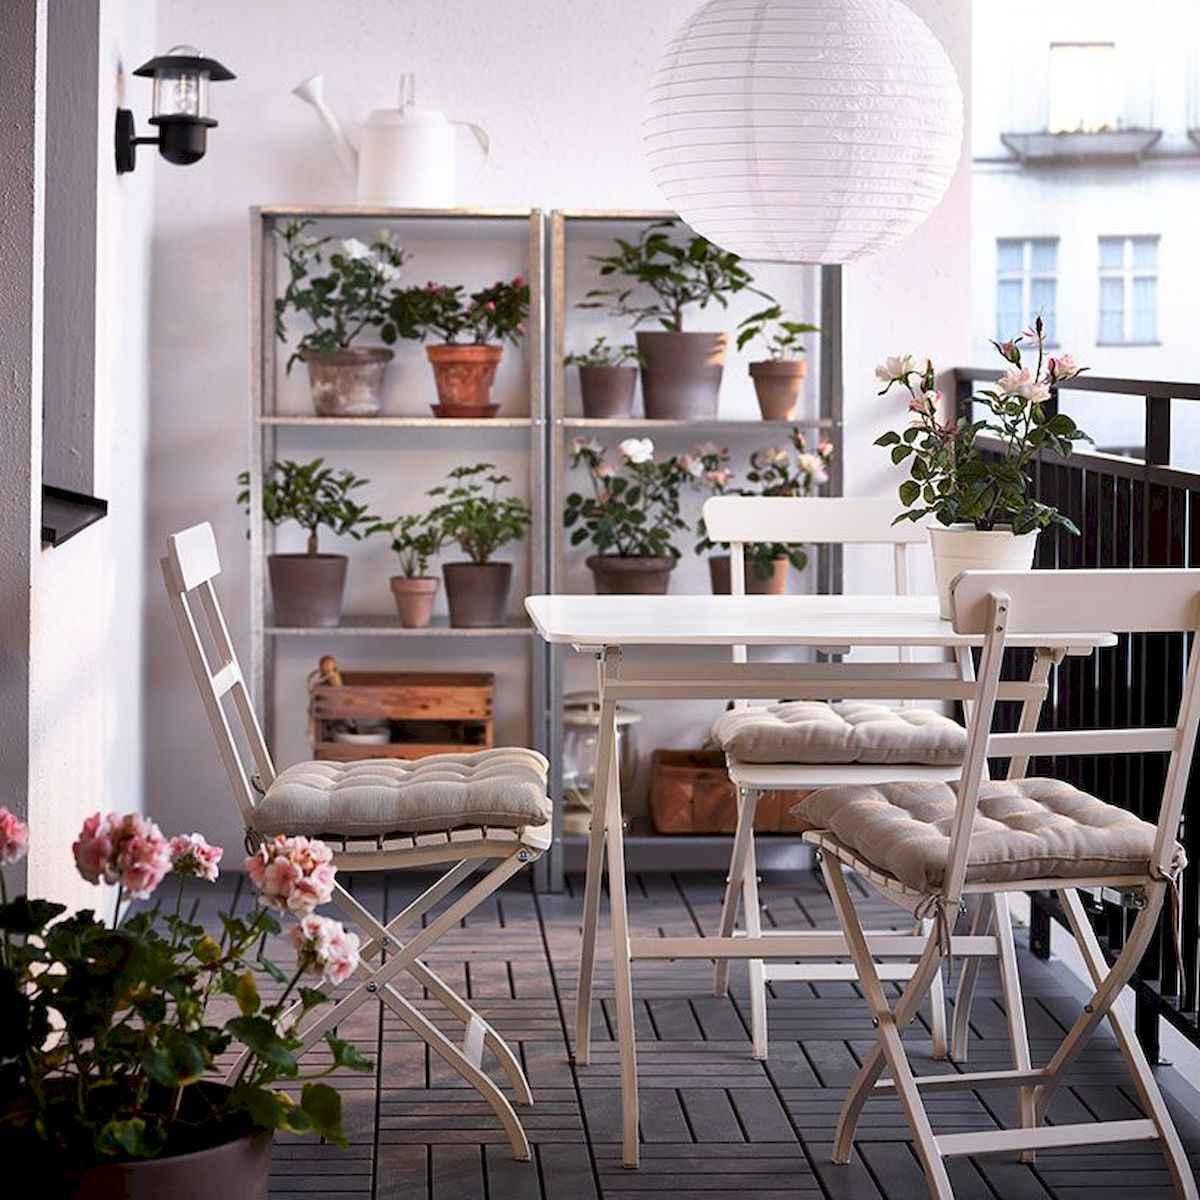 80 Small Apartment Balcony Decor Ideas And Makeover (15)